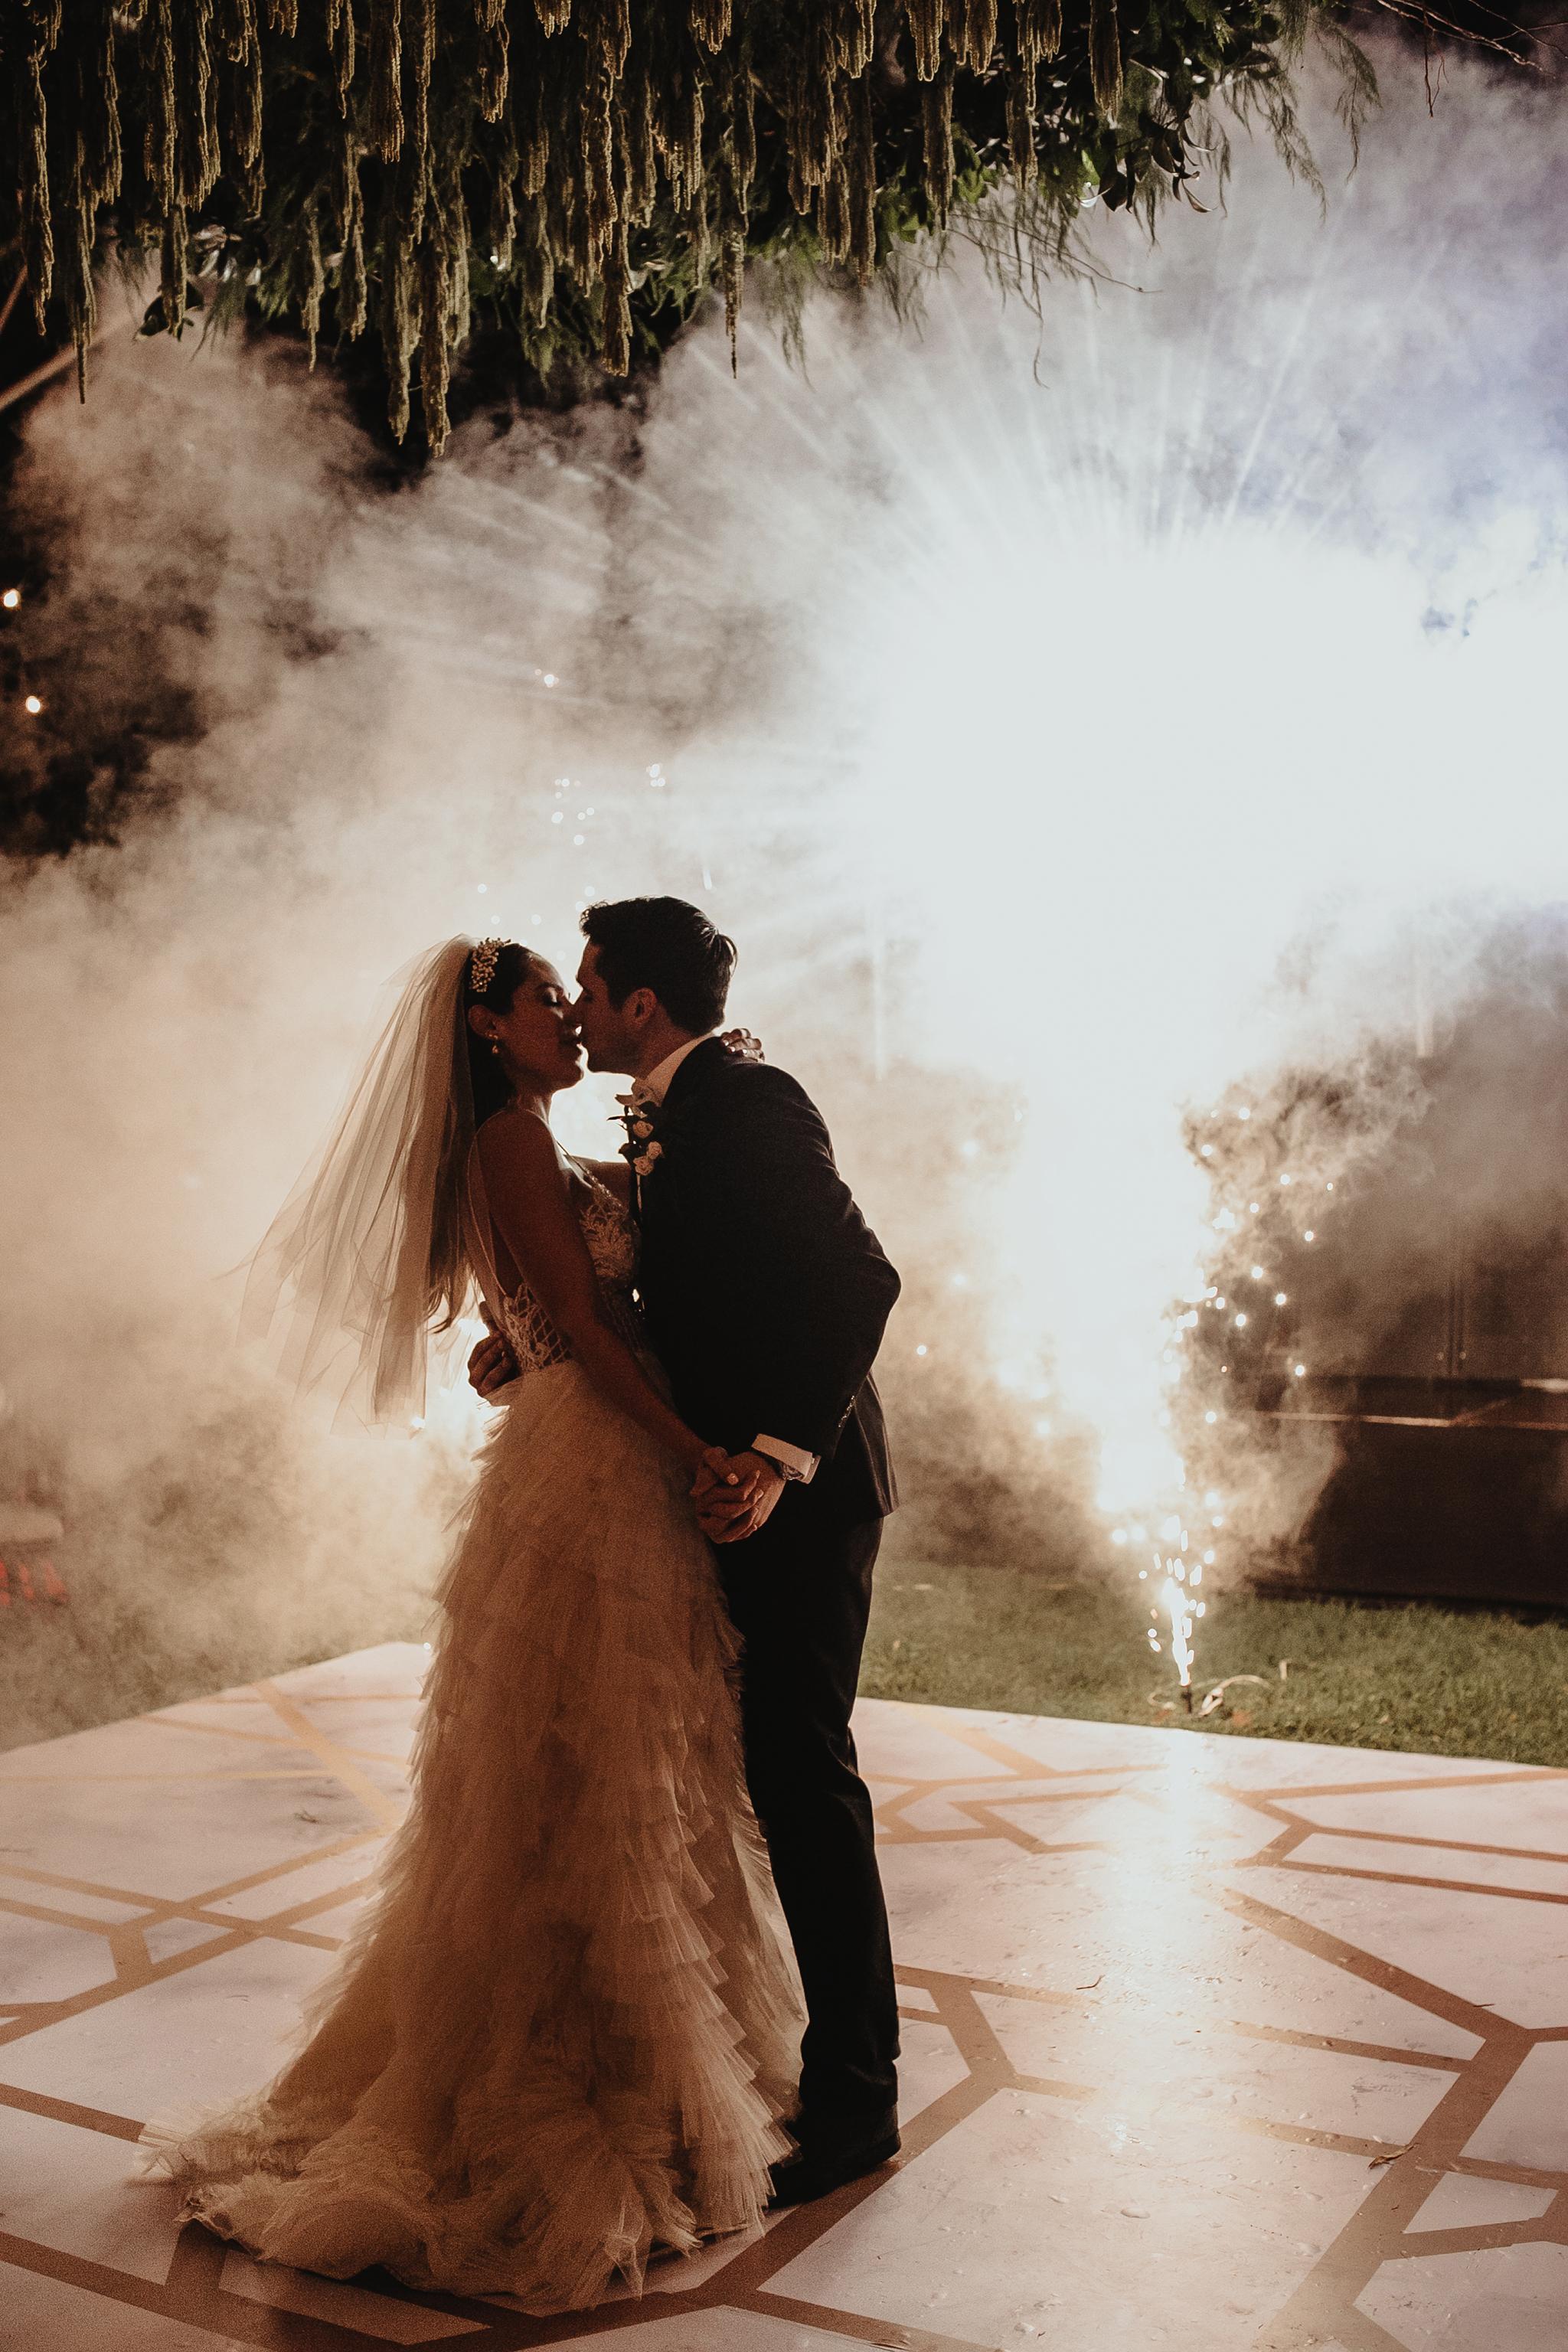 1116R&F__WeddingDestination_Weddingmerida_BodaMexico_FotografoDeBodas_FabrizioSimoneenFotografo.jpg